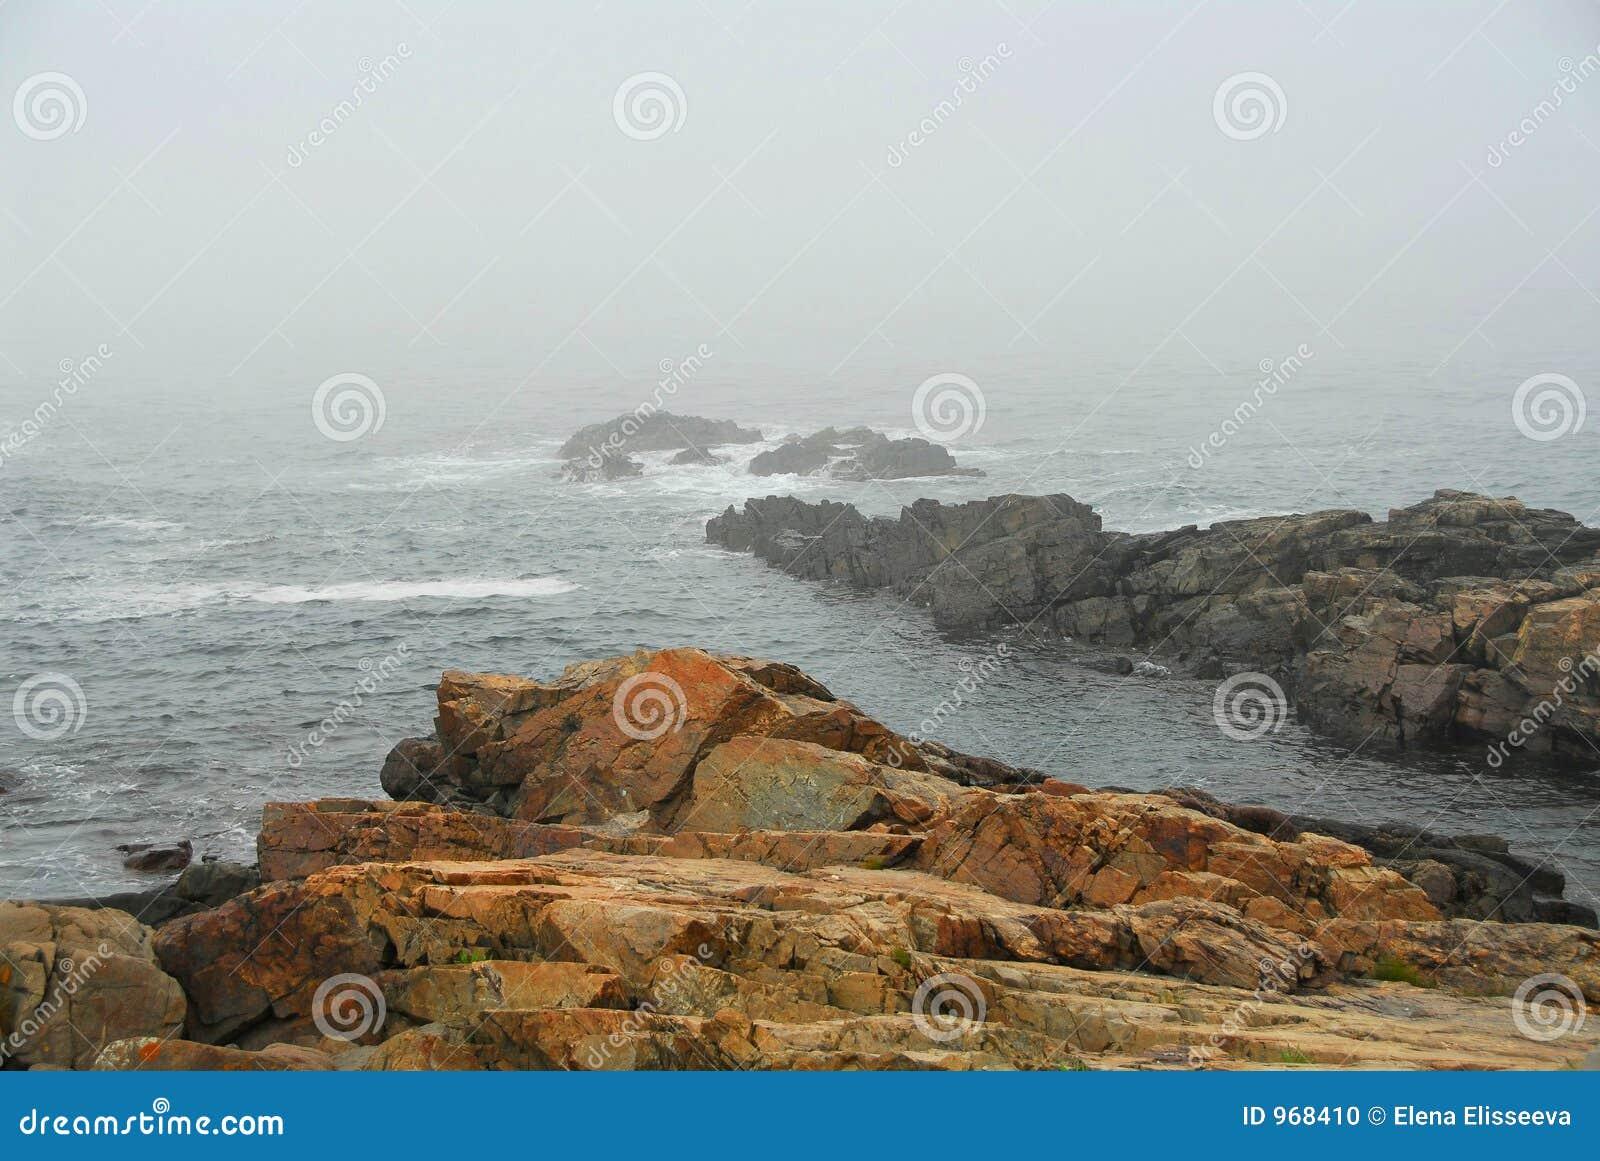 Felsige Küste in Maine